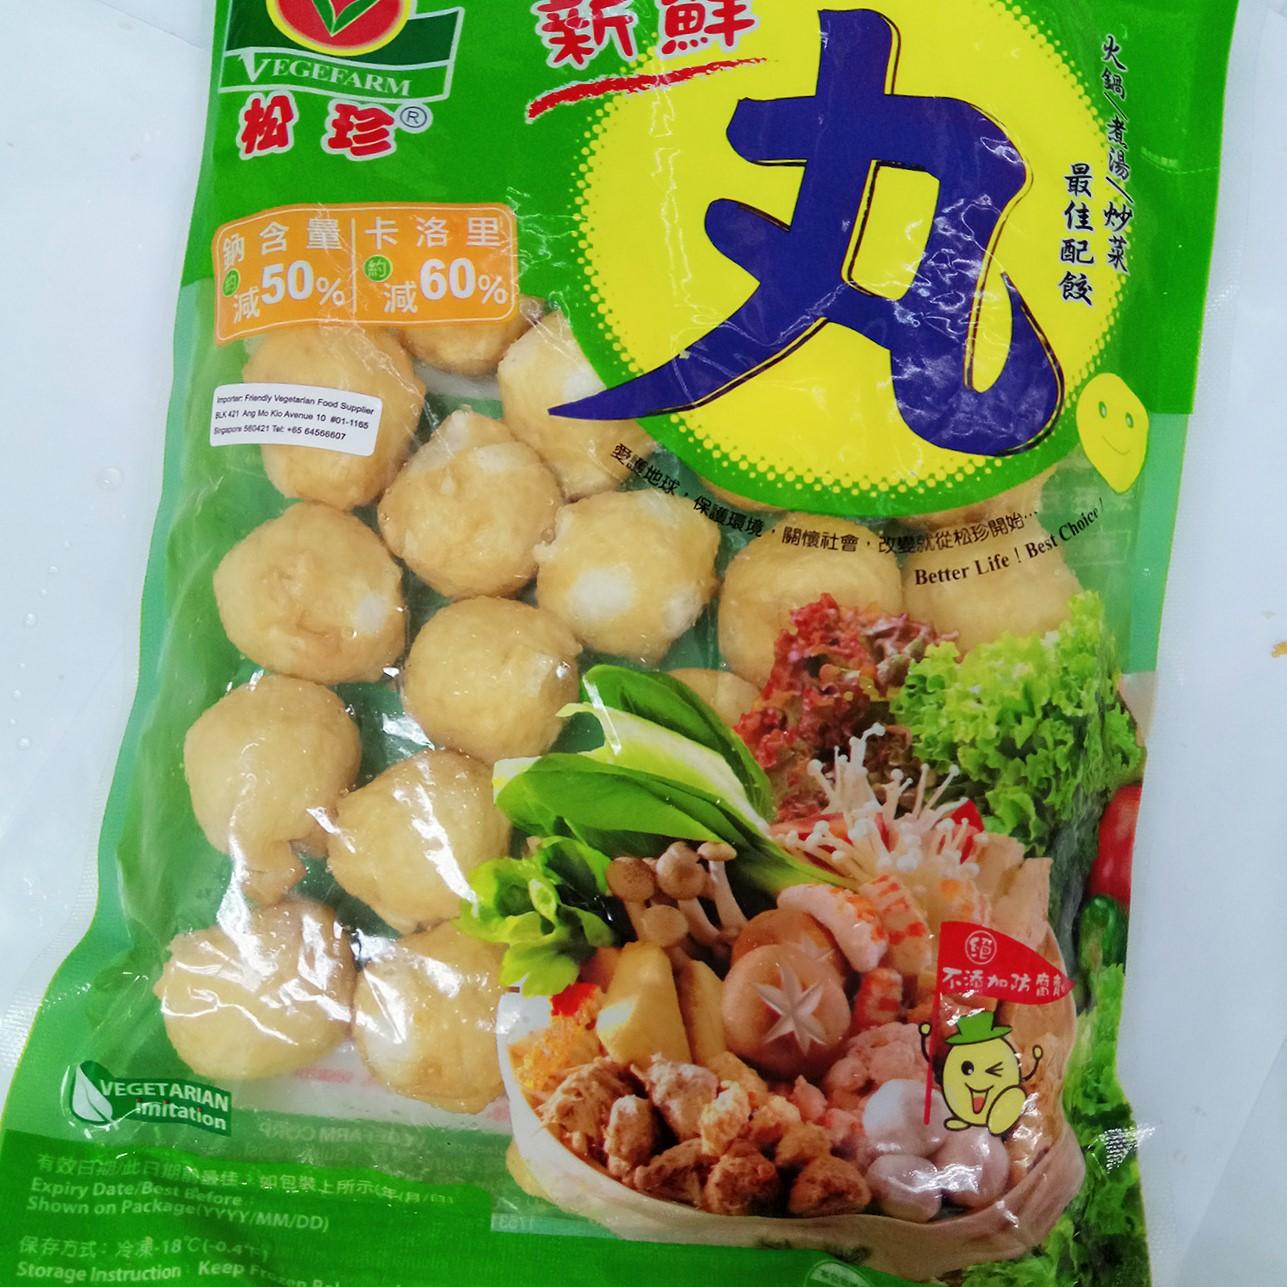 Image Vegefarm Vege Fried Squid Ball 松珍-花枝杨 花枝揚 454grams